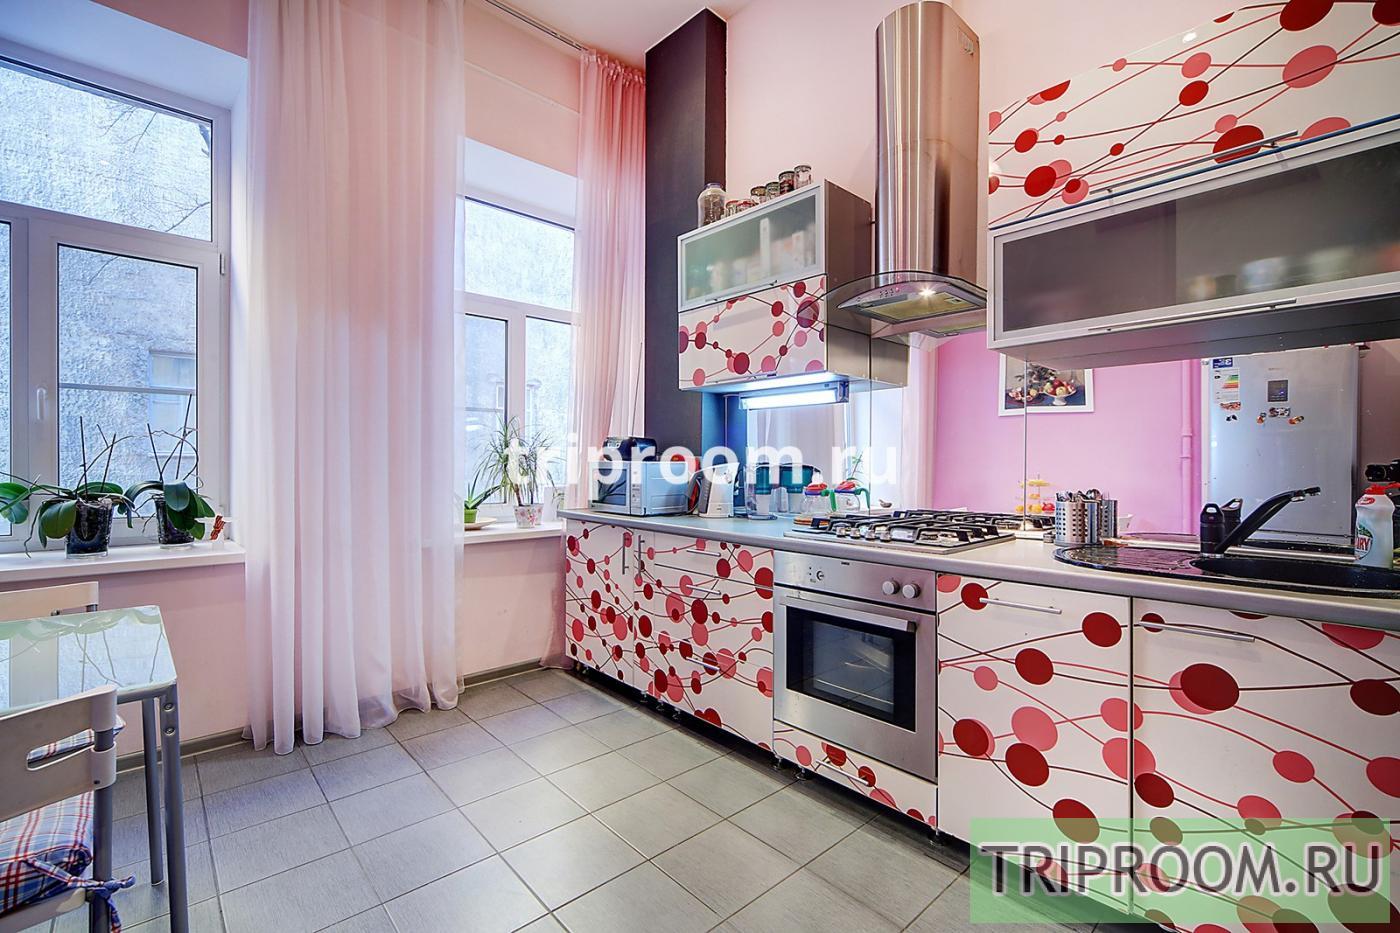 2-комнатная квартира посуточно (вариант № 15426), ул. Лиговский проспект, фото № 19